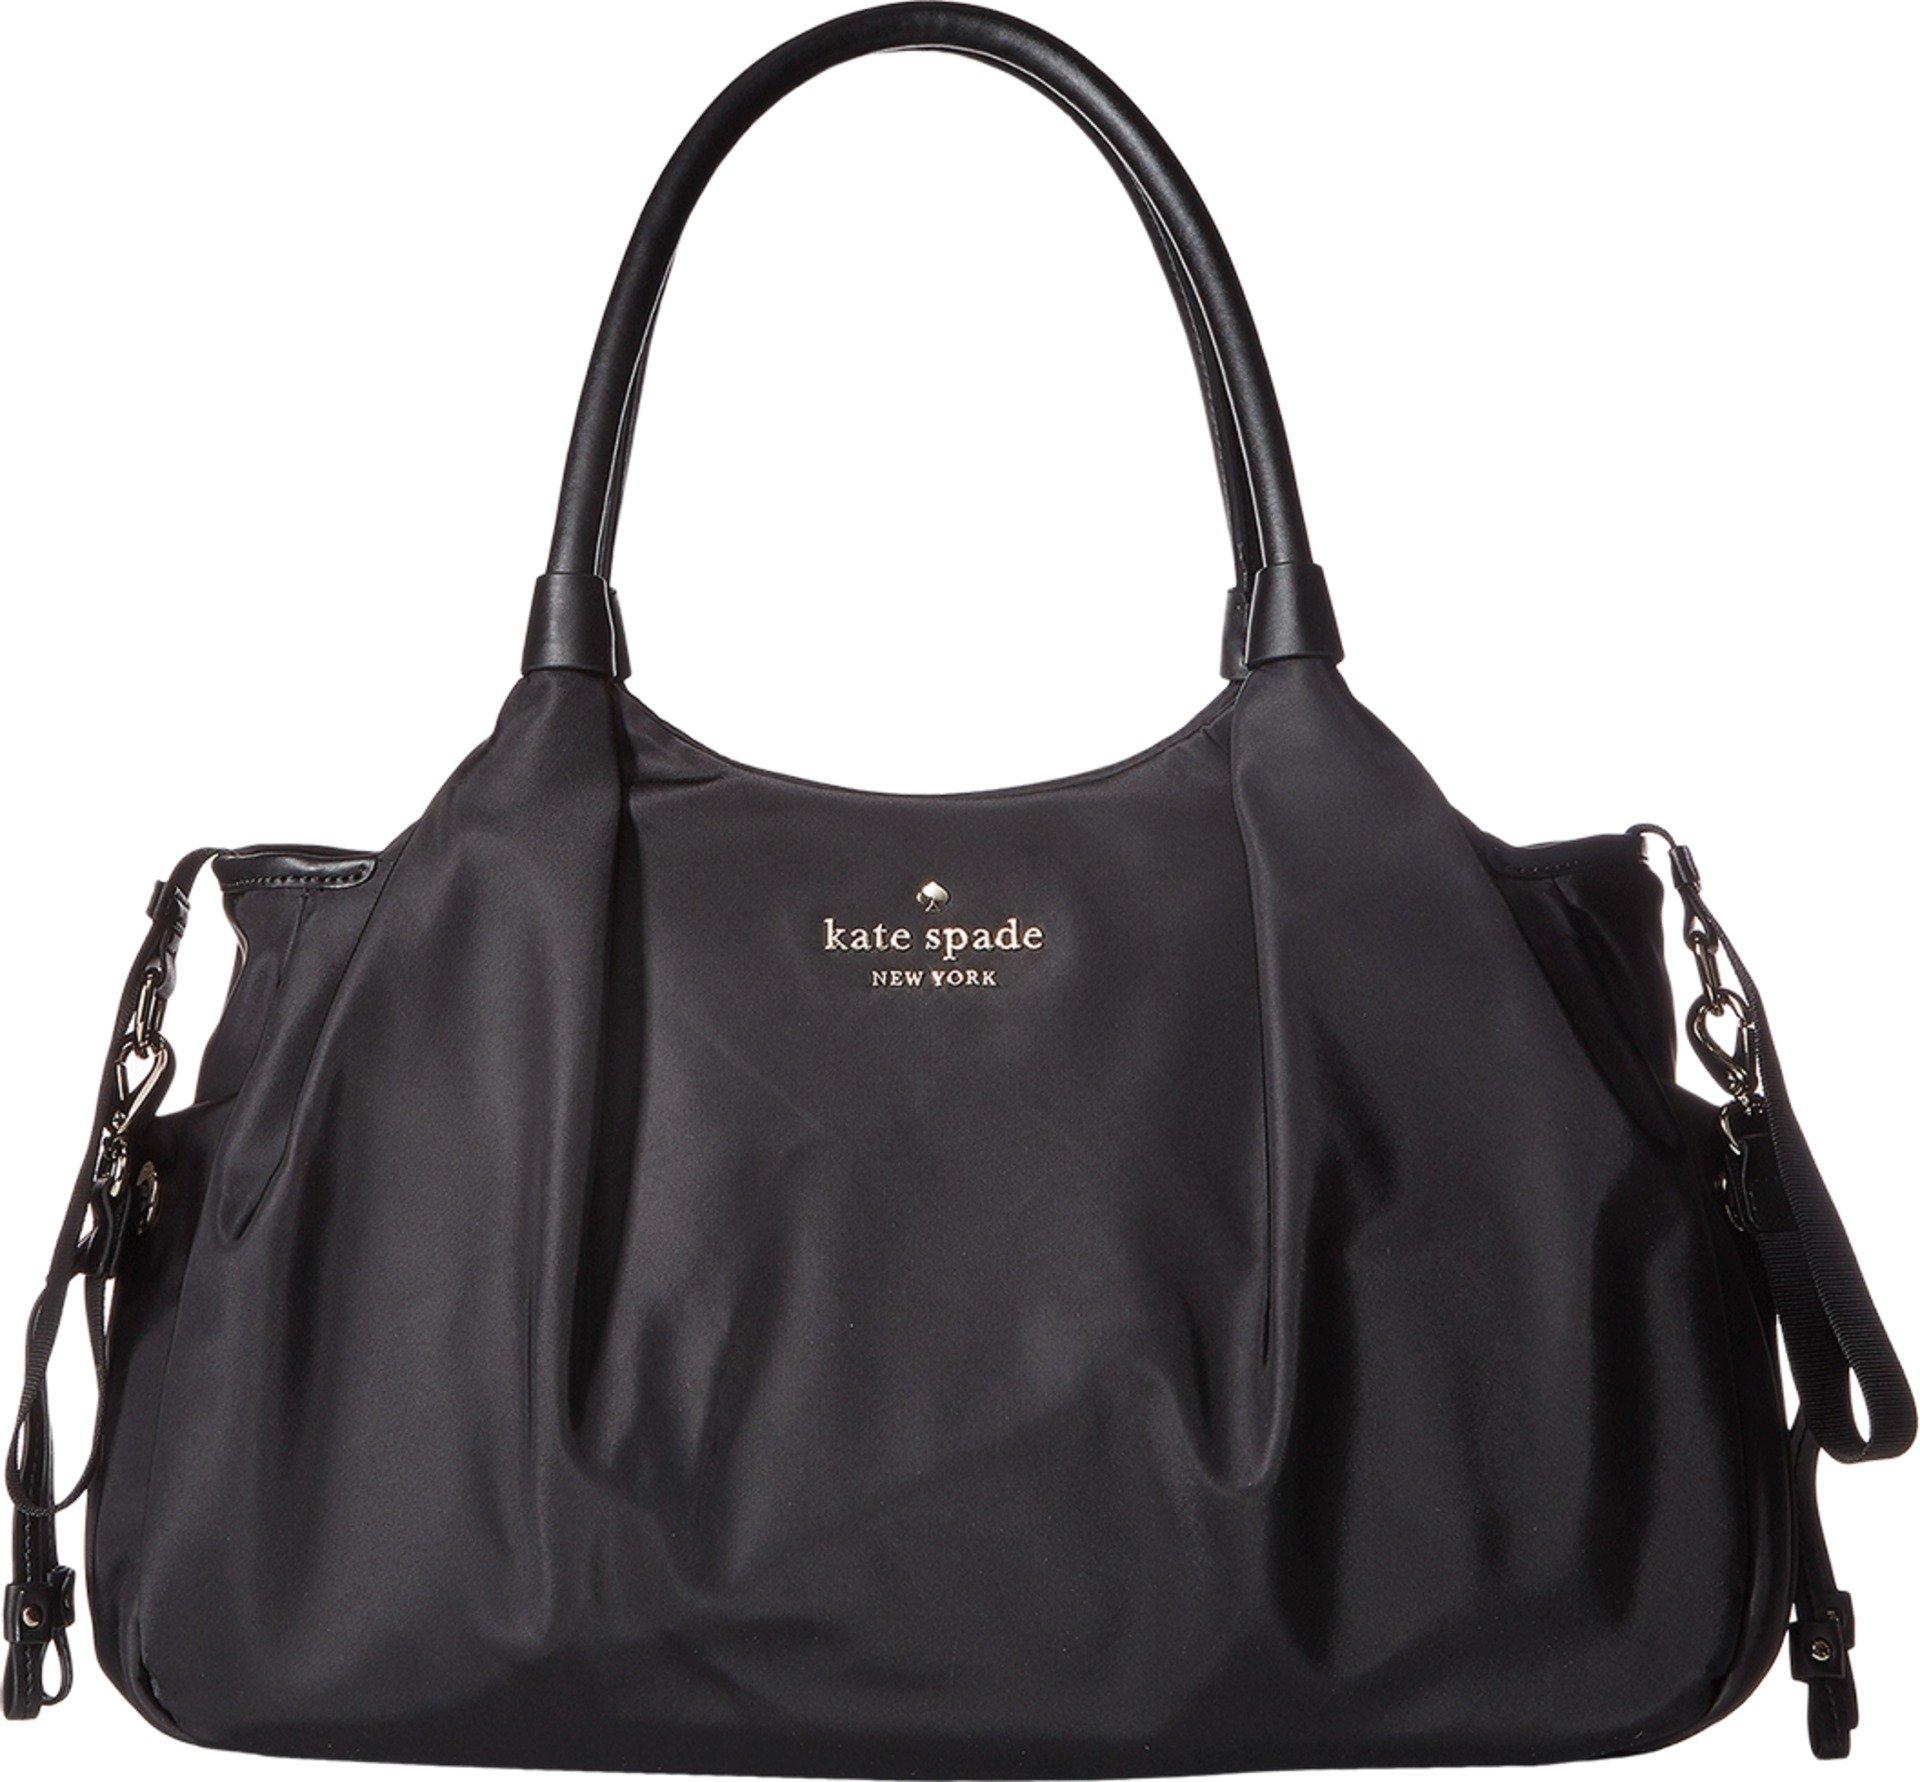 Kate Spade New York Women's Watson Lane Stevie Baby Bag Black Handbag